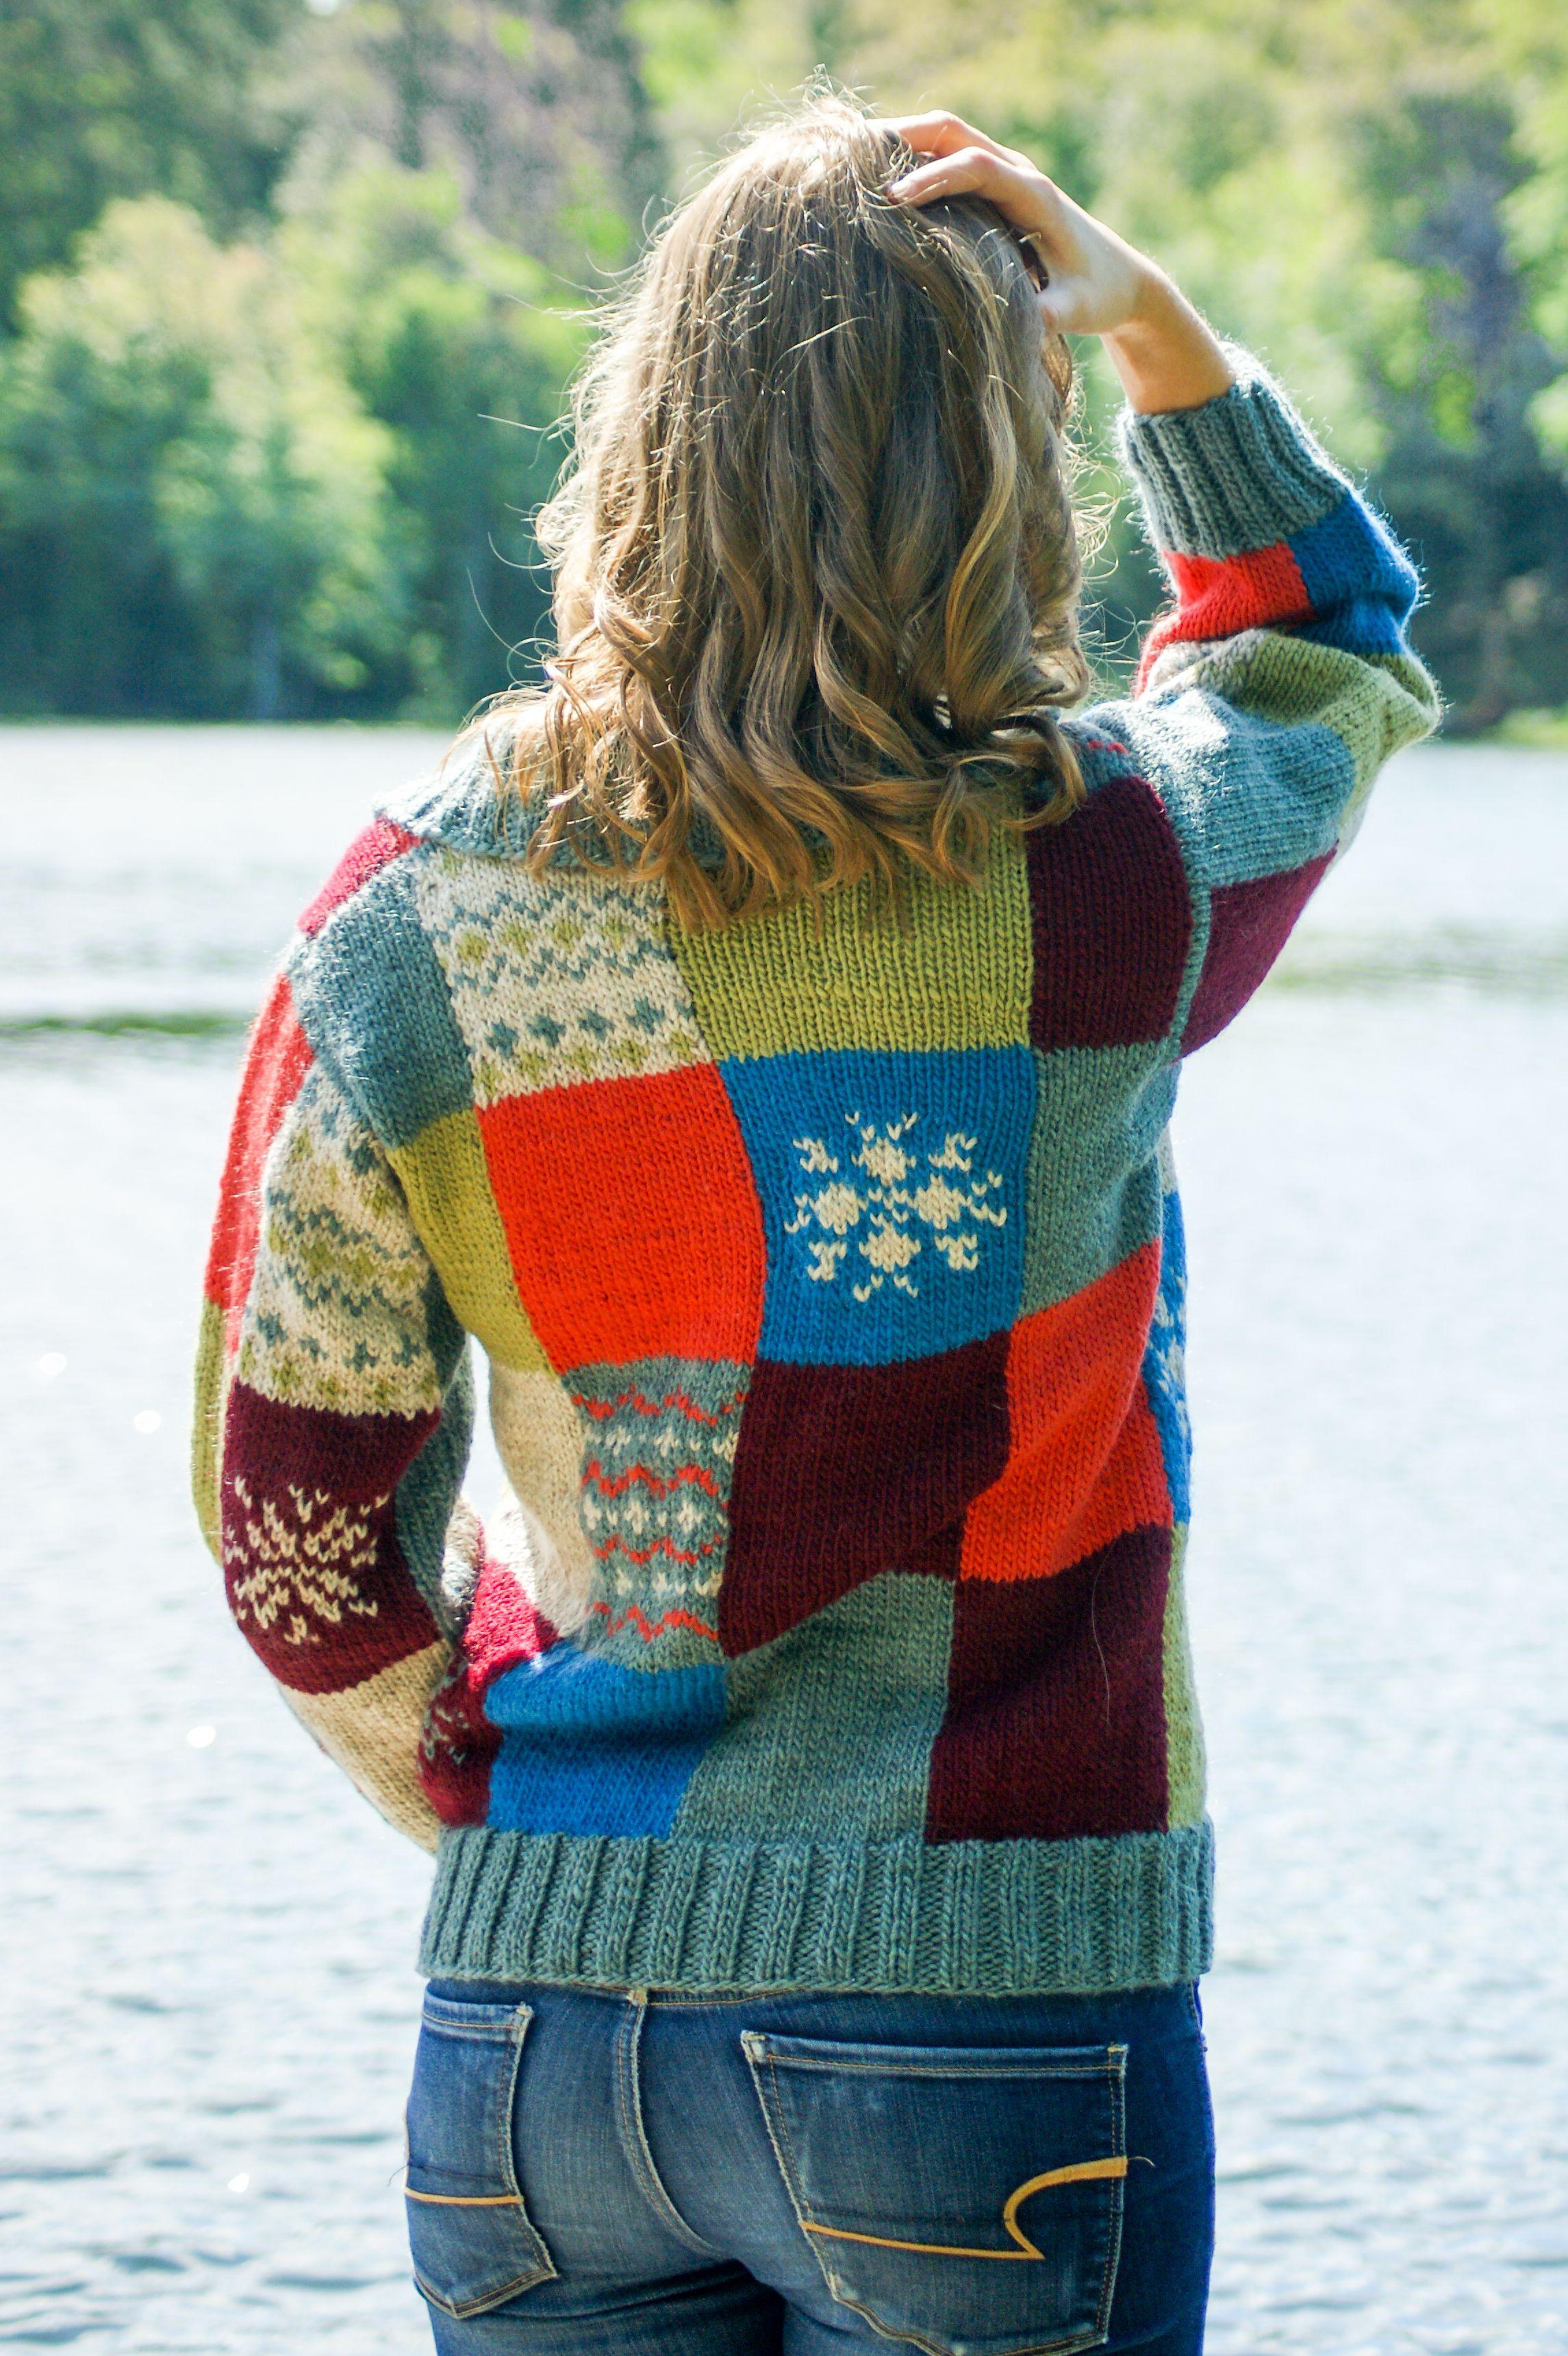 Patchwork Meadow Jacket | Knit cardigan pattern, Sweater ...